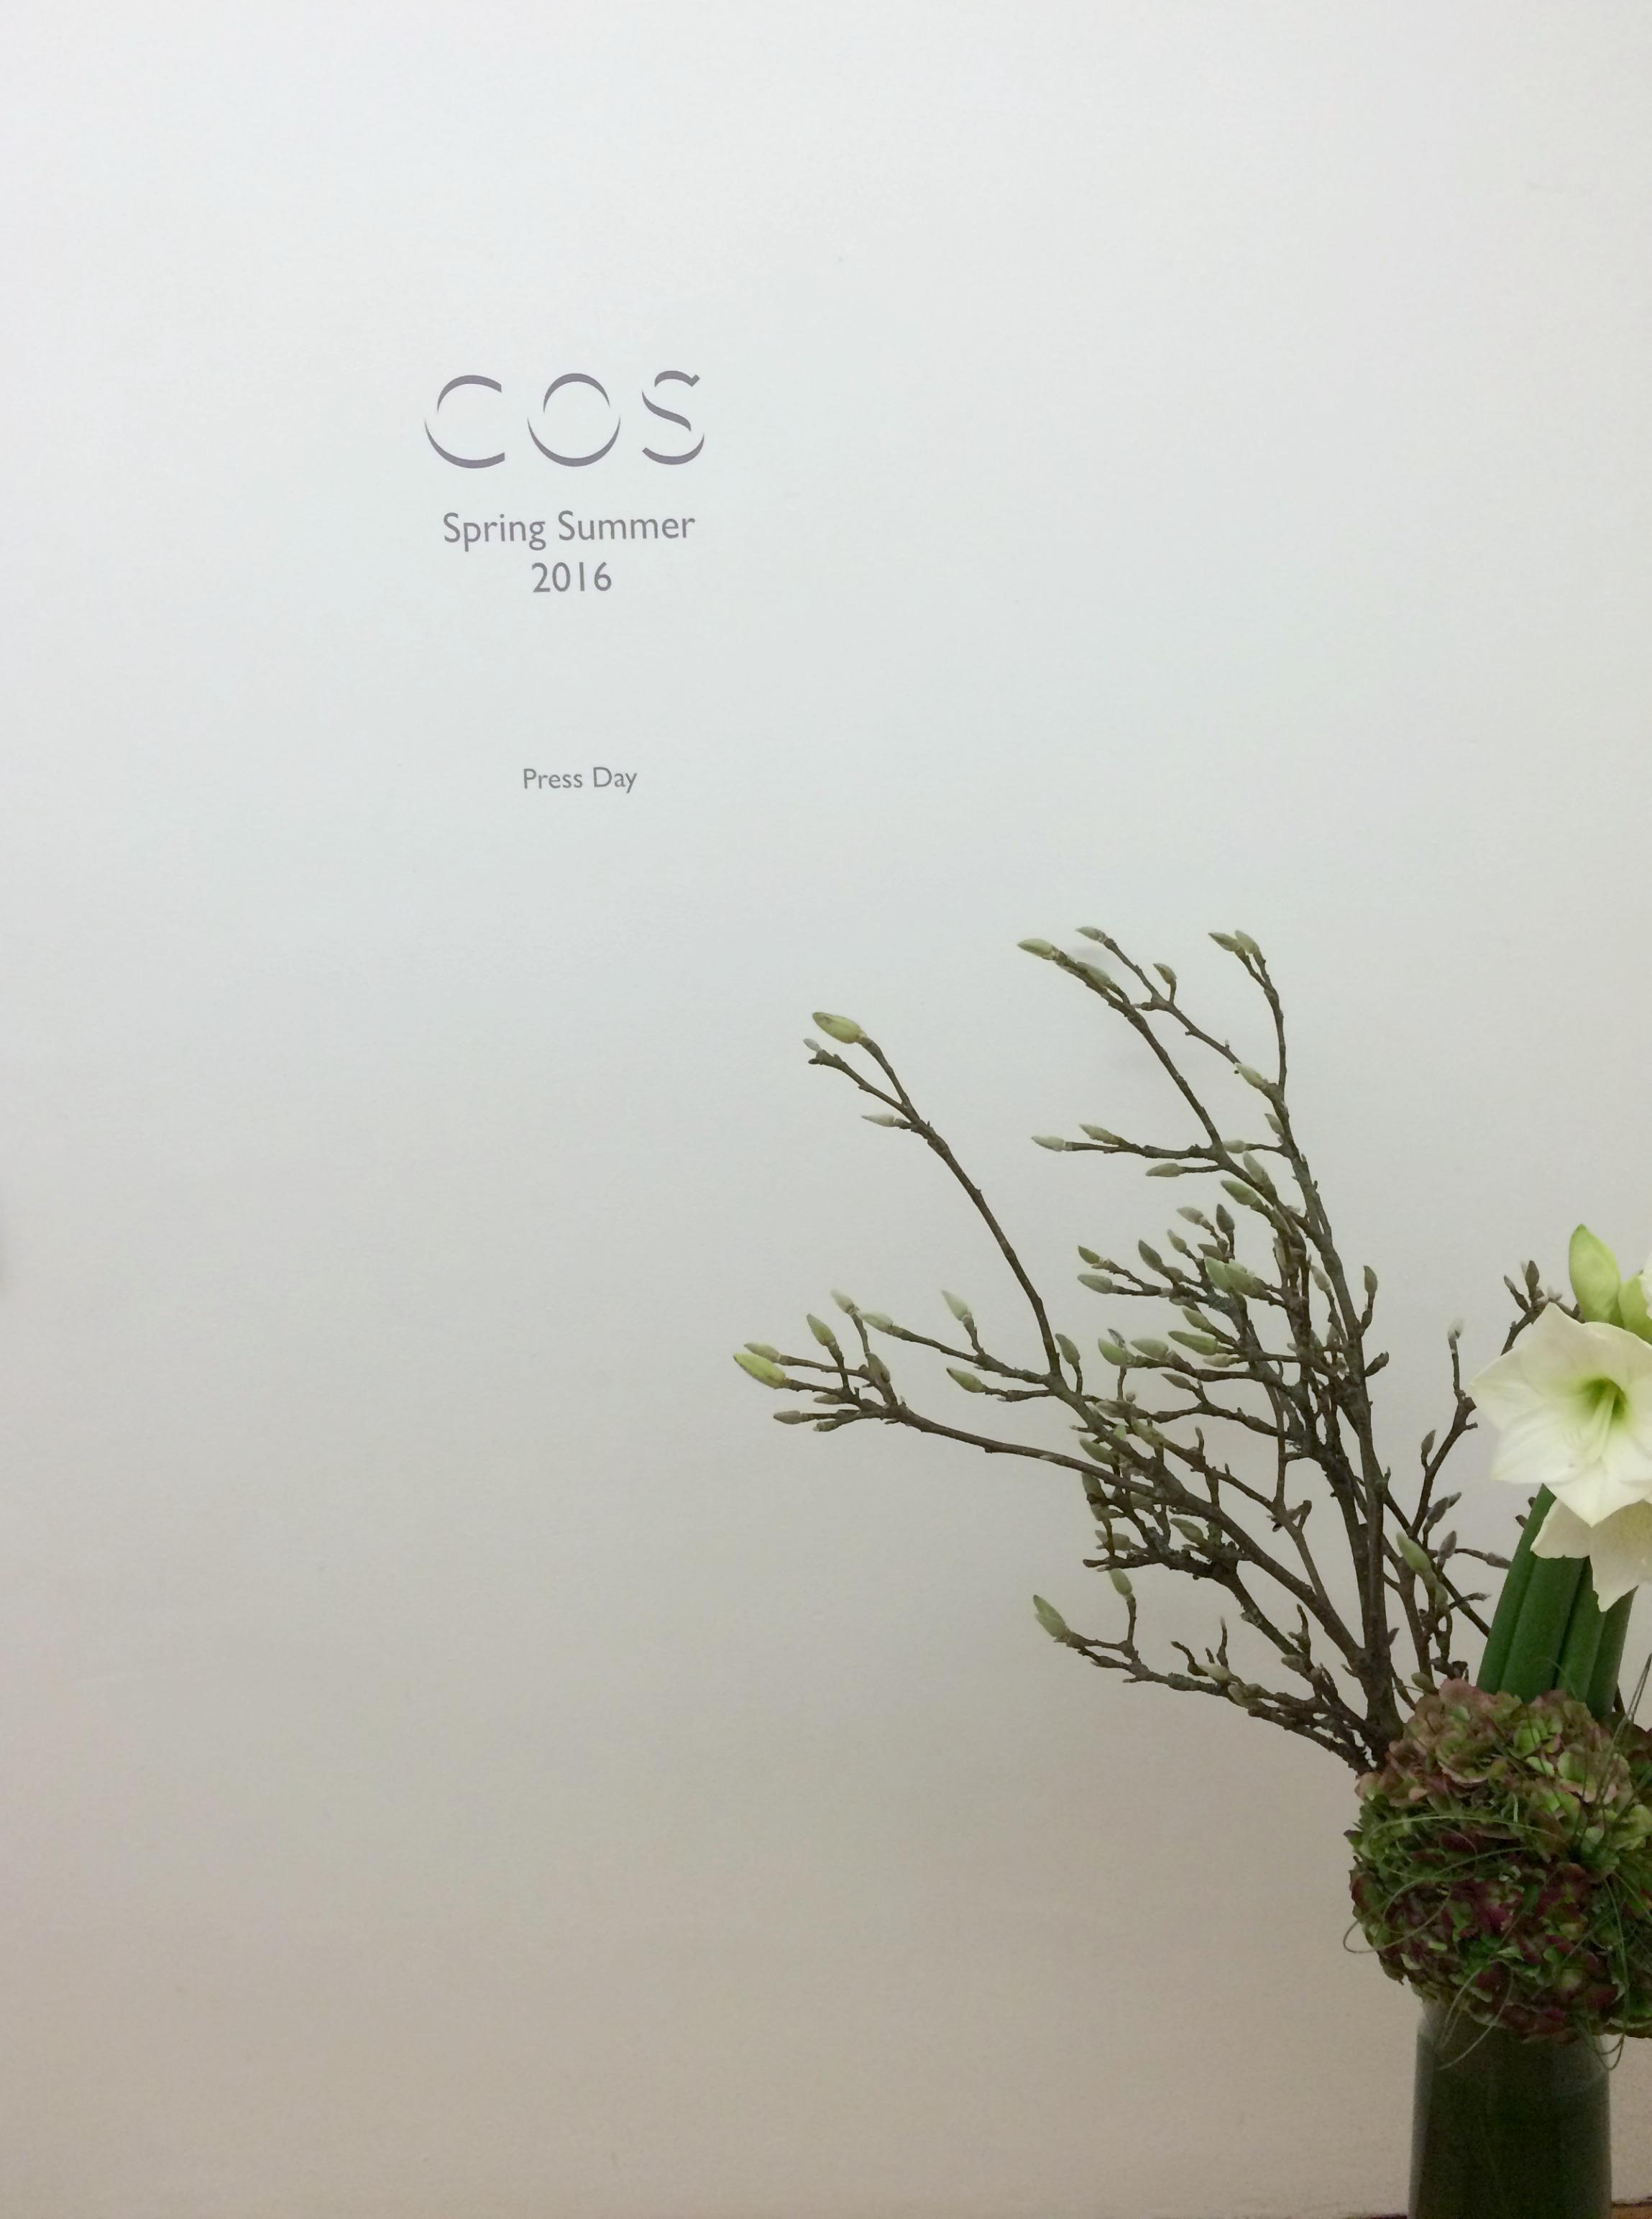 Cos SS16